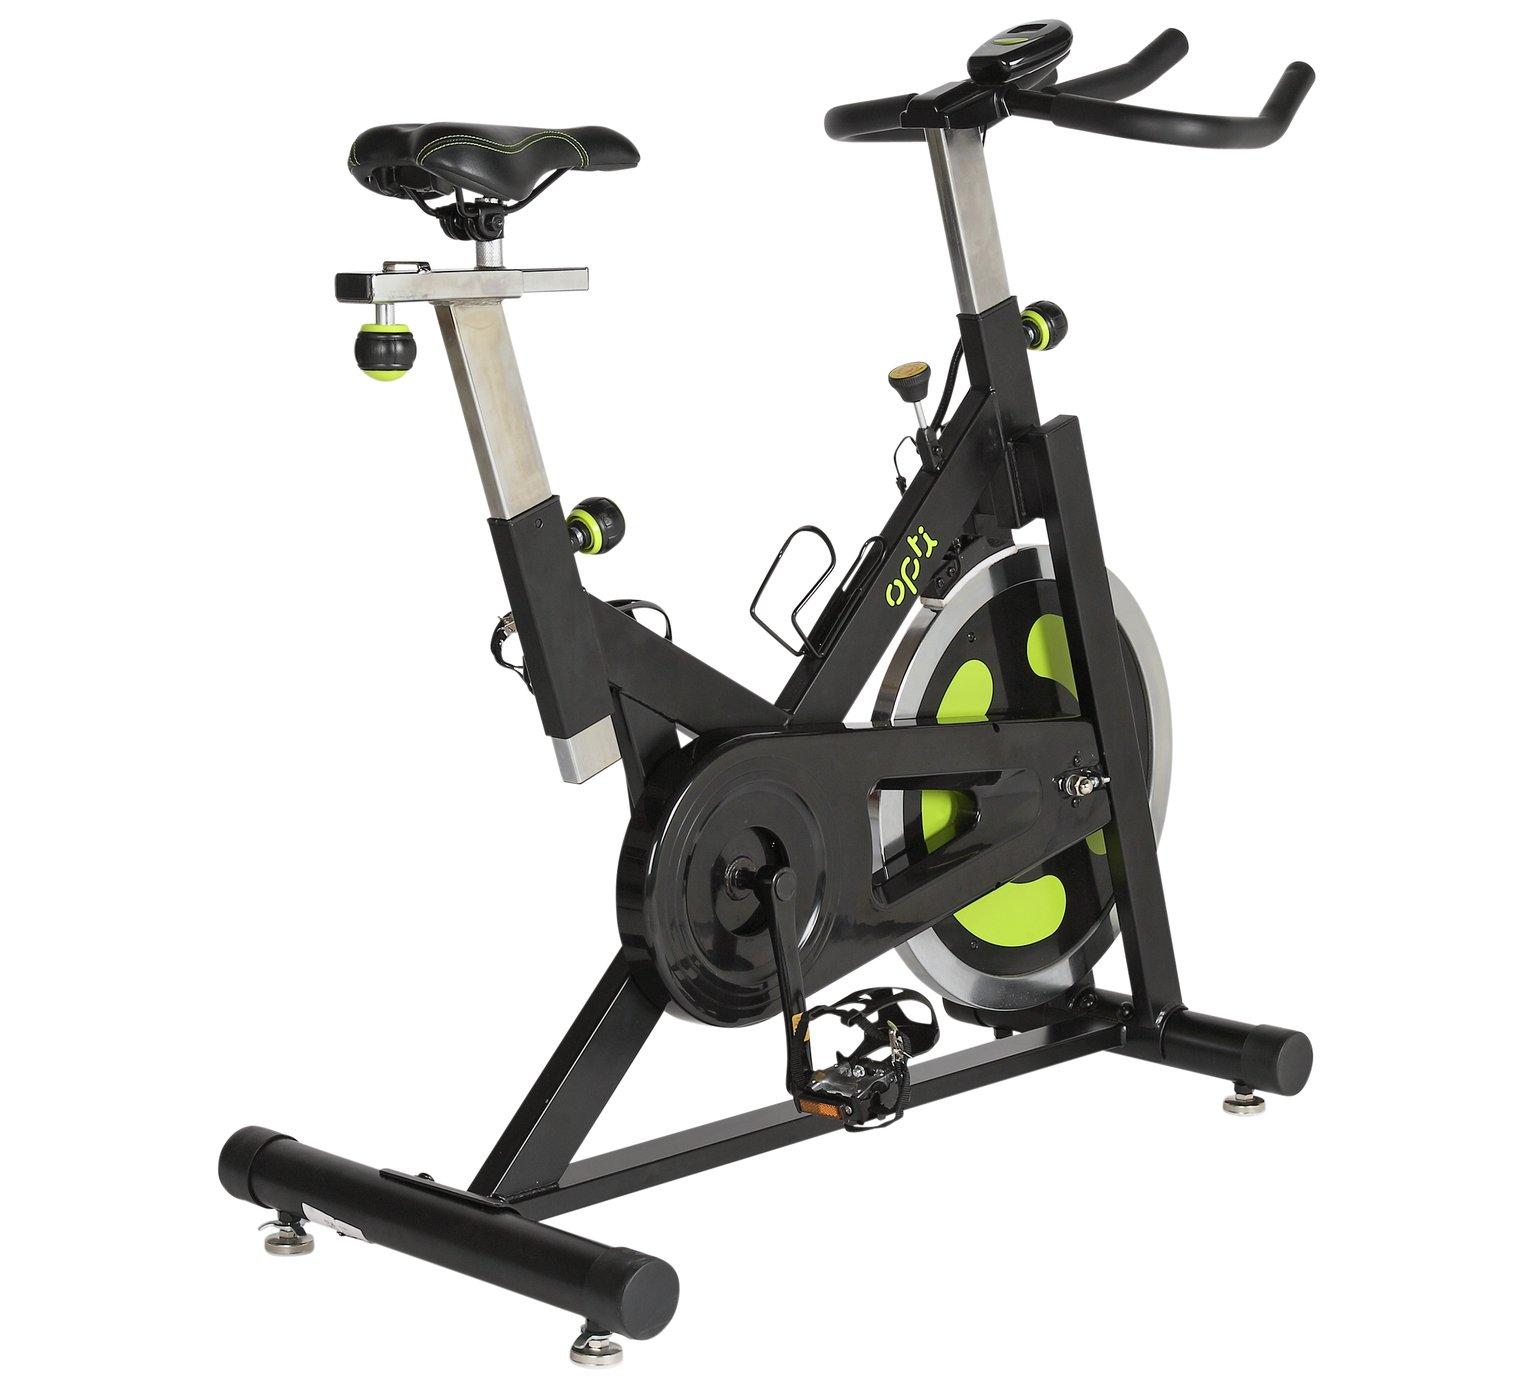 Opti Aerobic Manual Exercise Bike